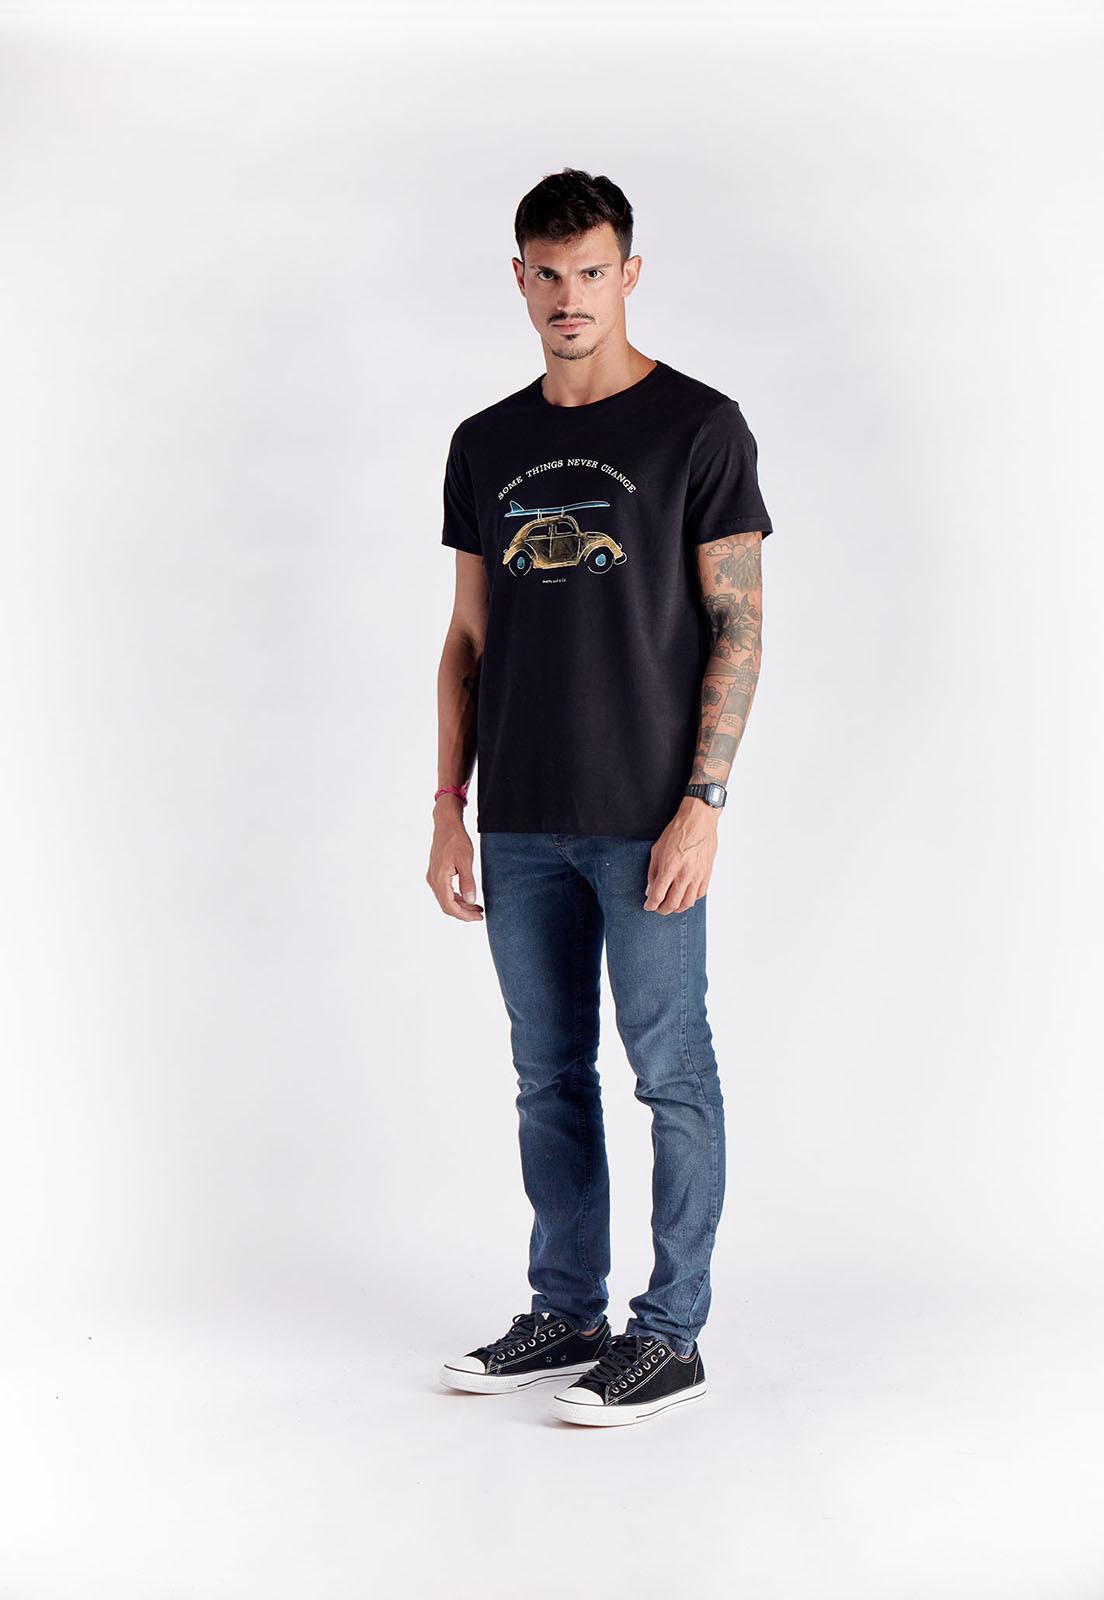 T-shirt Beetle Preto Melty